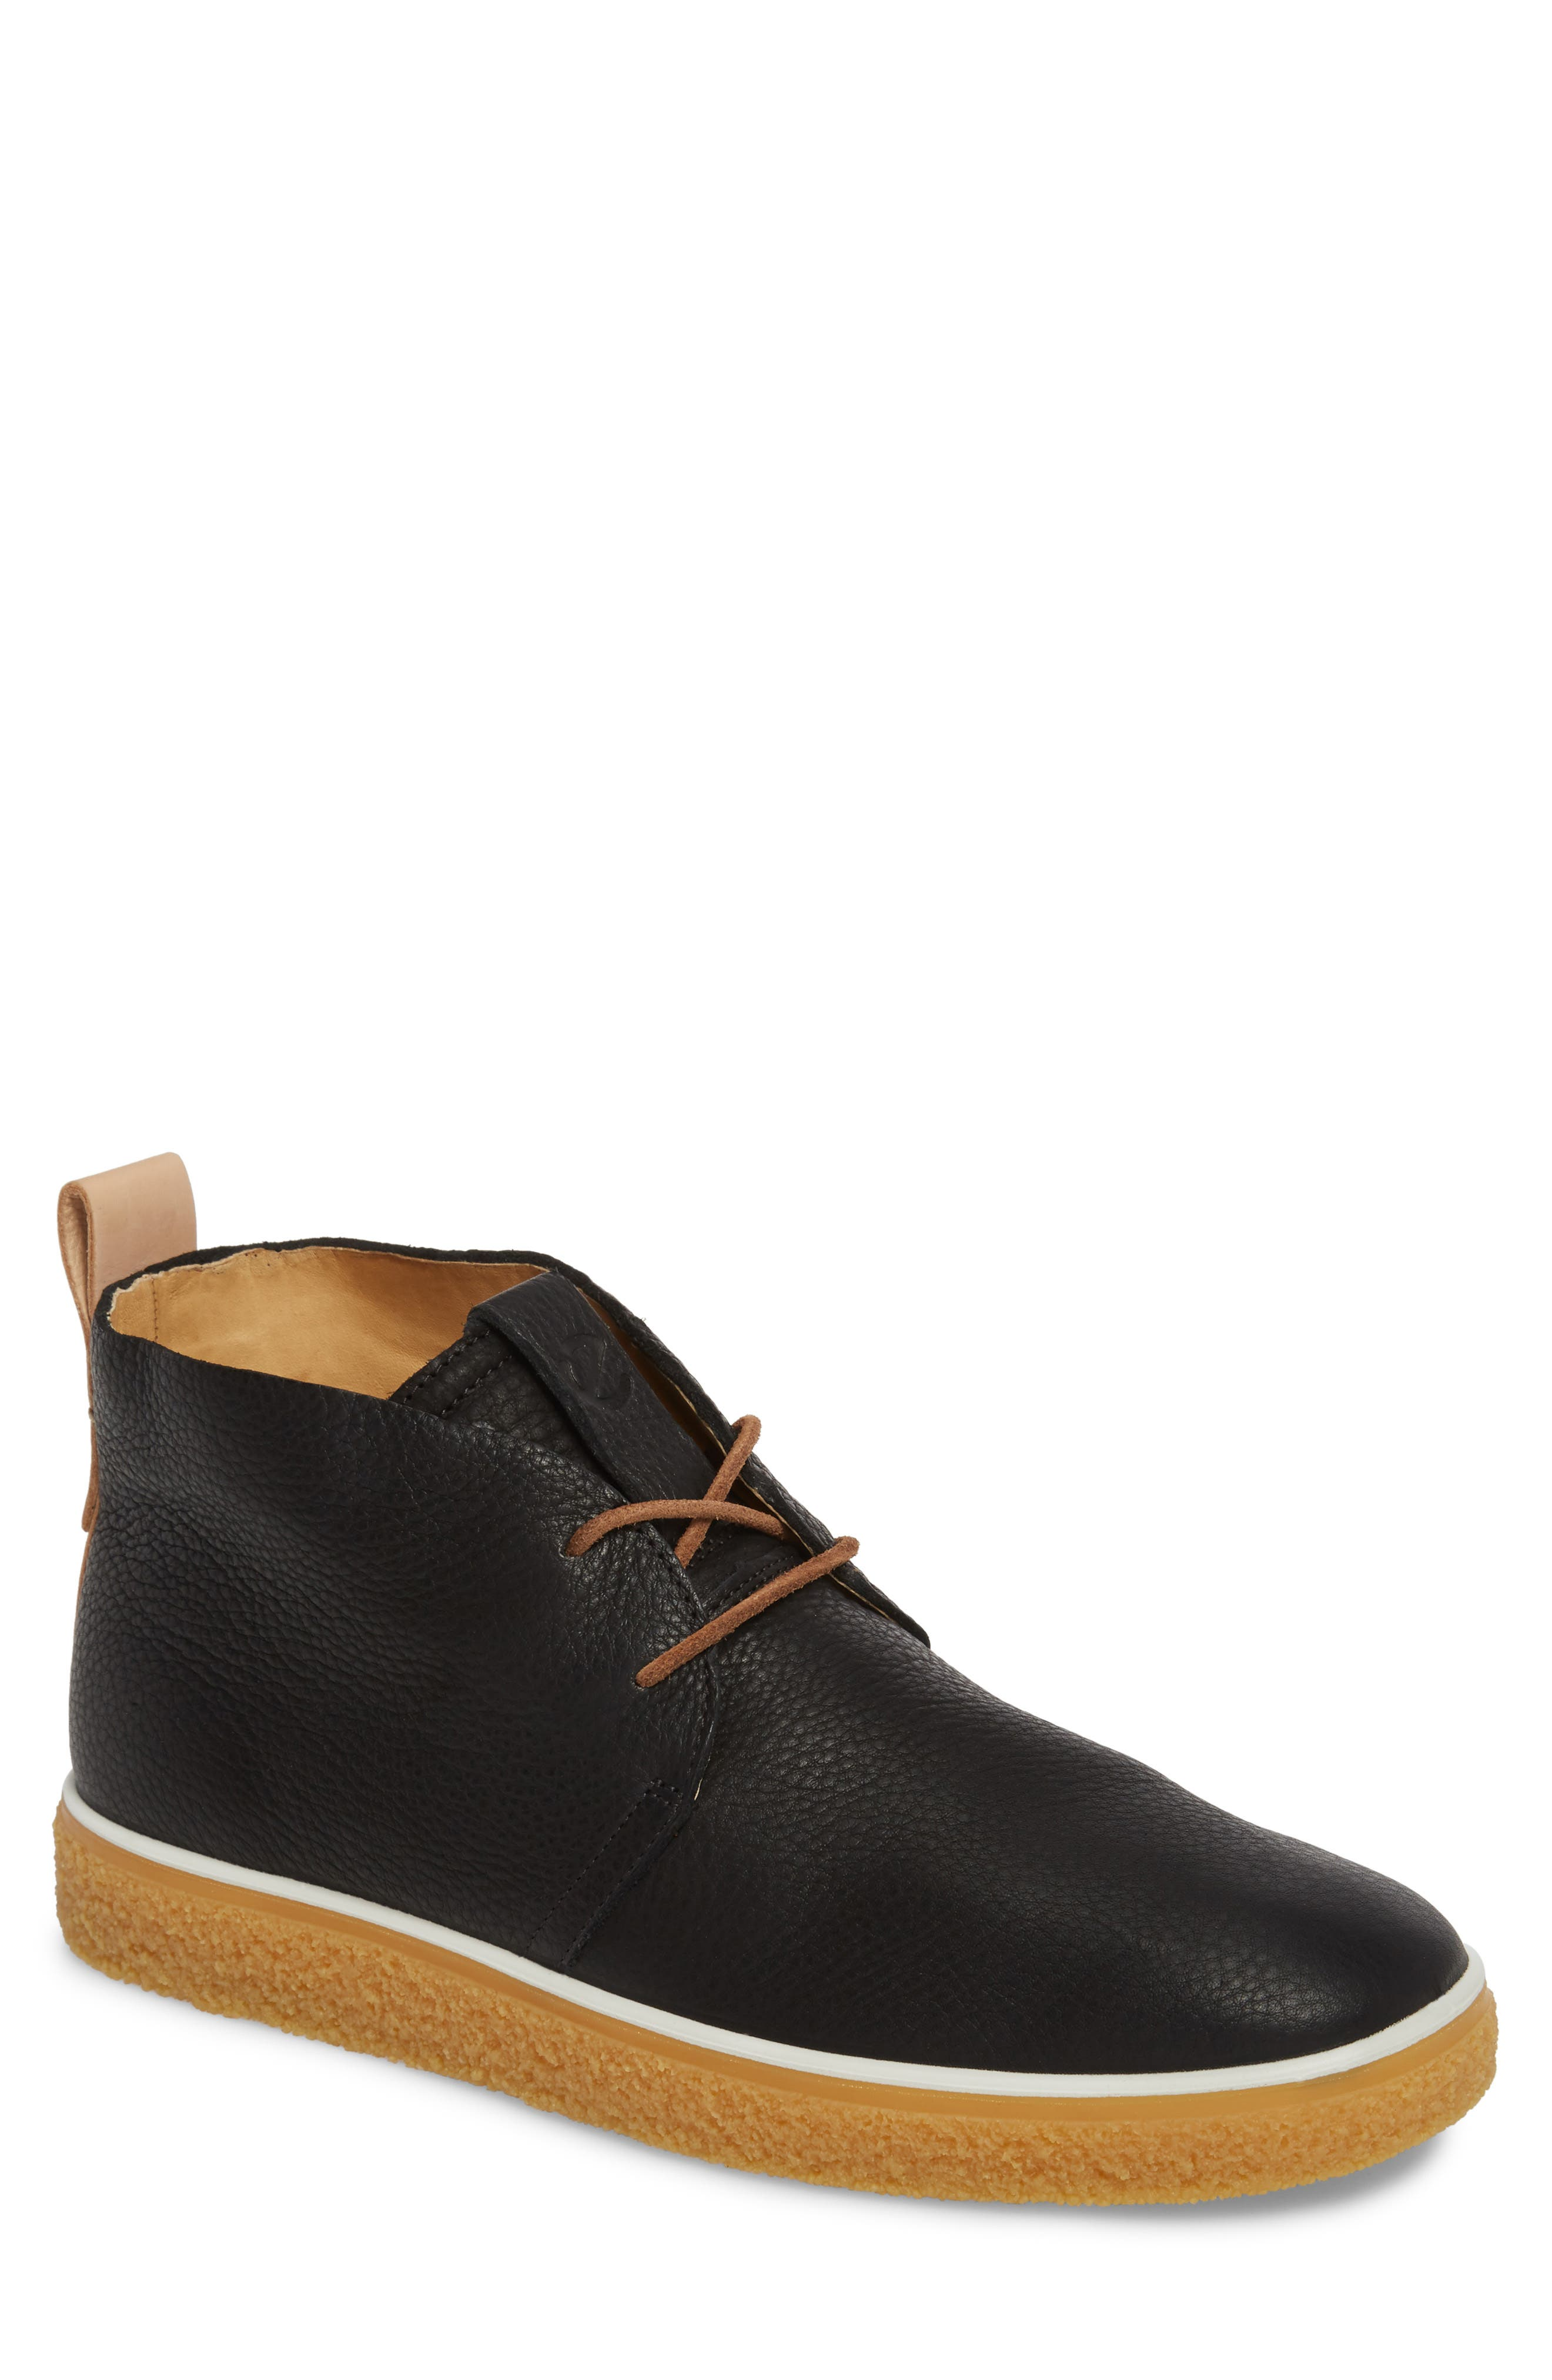 Crepetray Chukka Boot,                         Main,                         color, 009